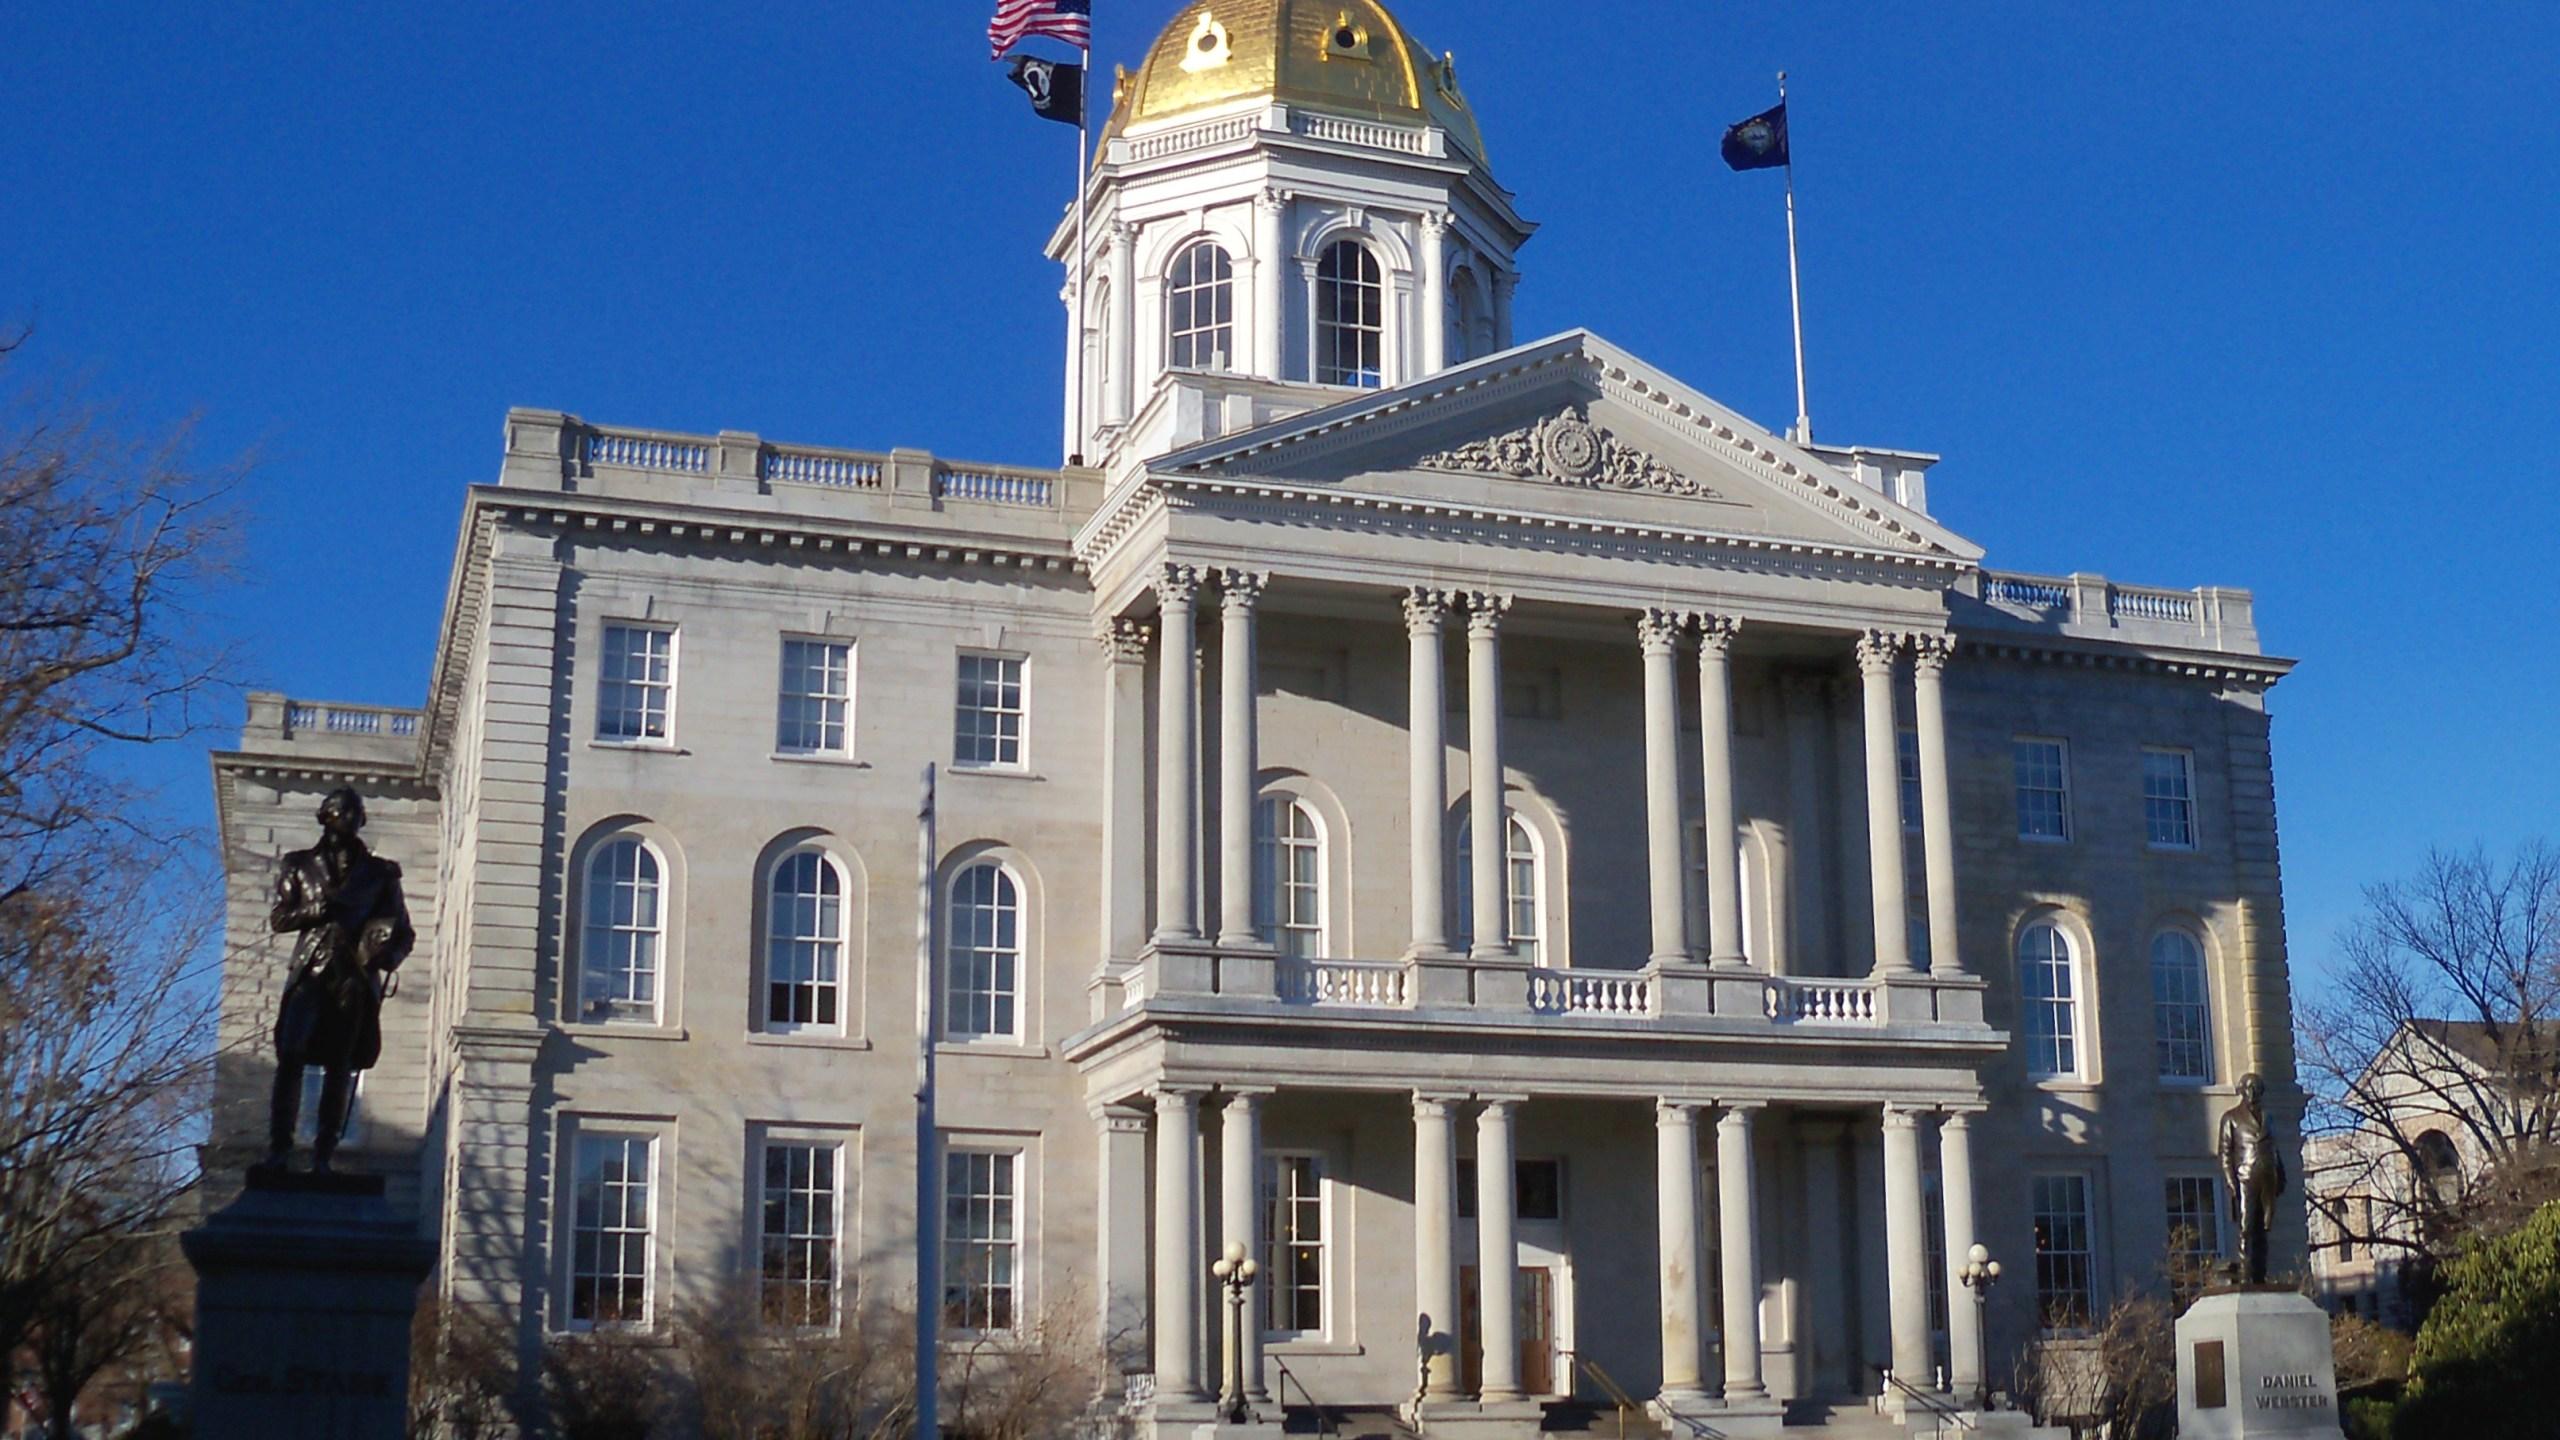 New_Hampshire_State_House_5_1530195726278.jpeg